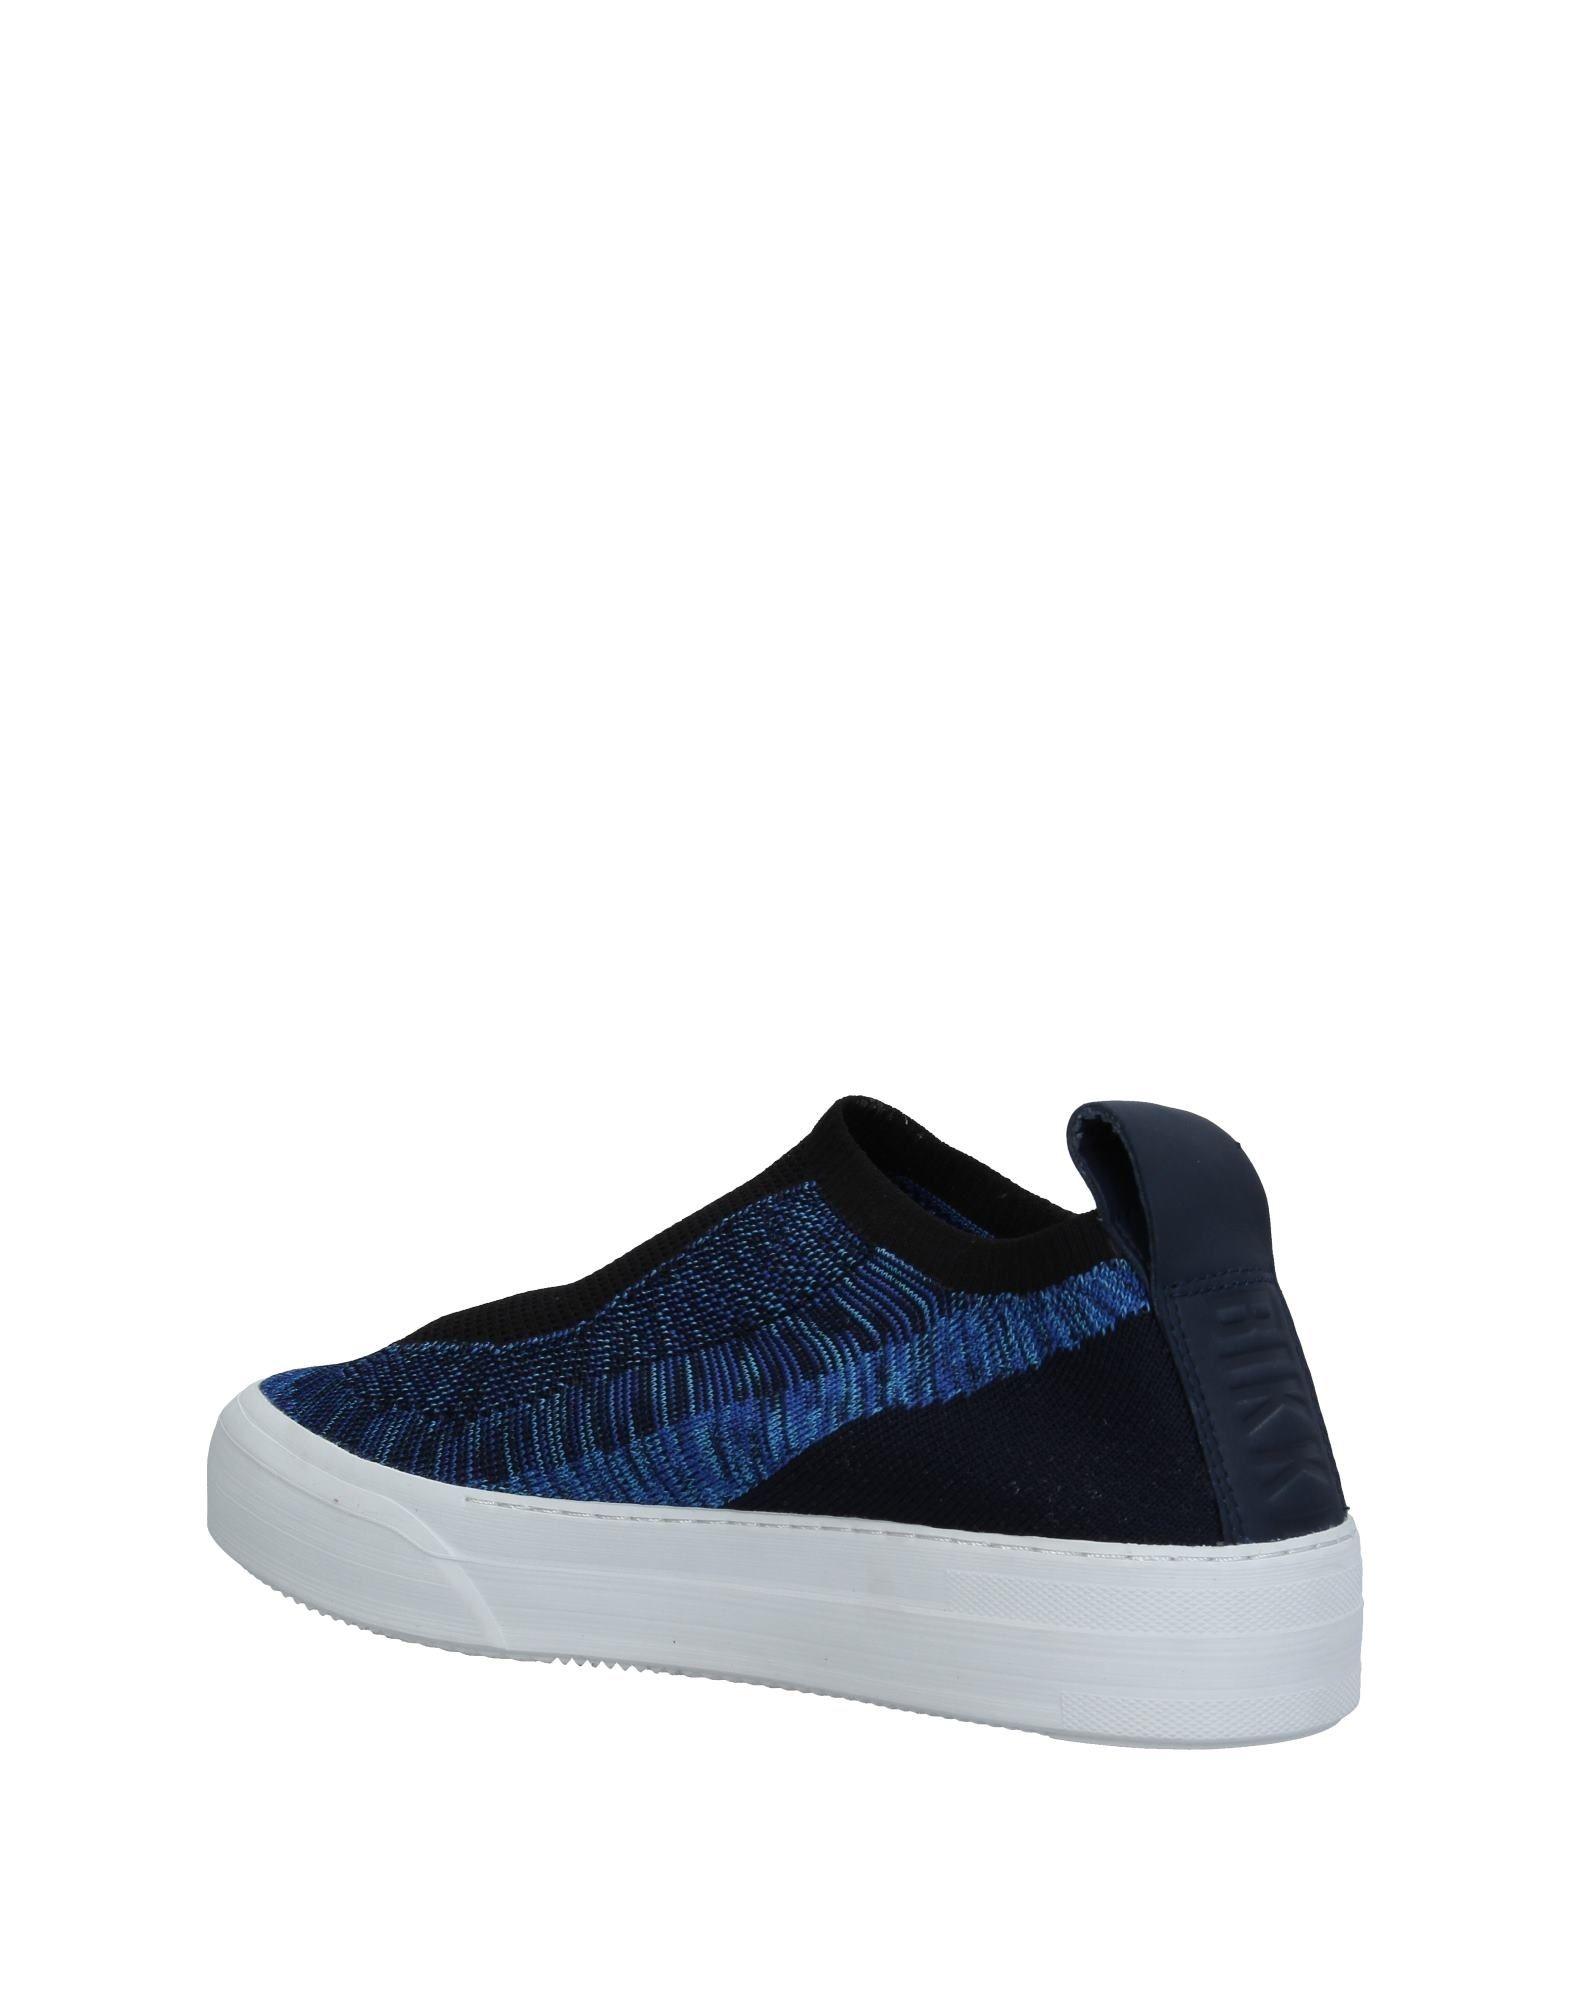 Bikkembergs Sneakers Herren    11332017AB Heiße Schuhe 9c90da